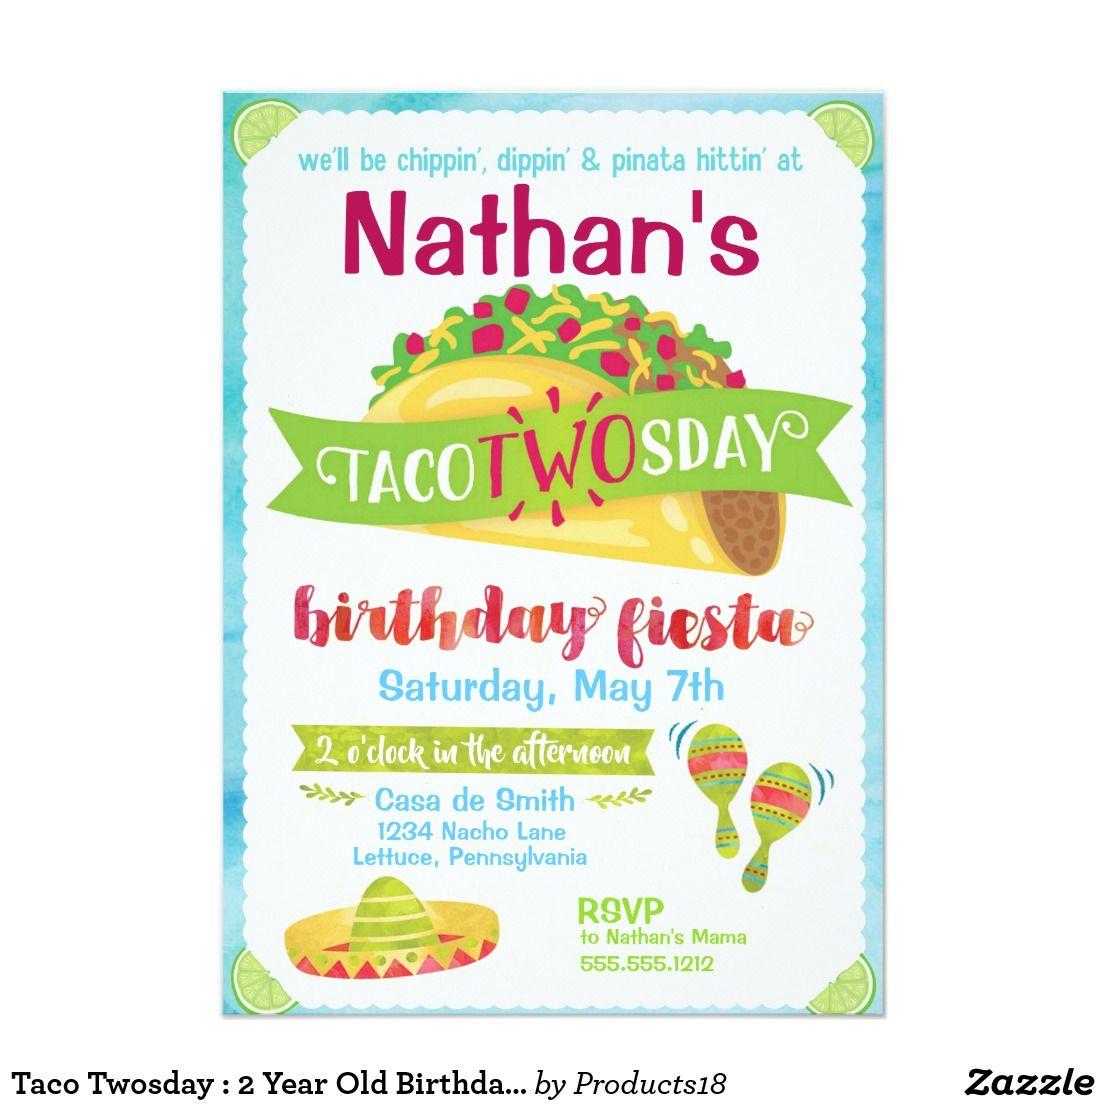 Taco Twosday 2 Year Old Birthday Invitations